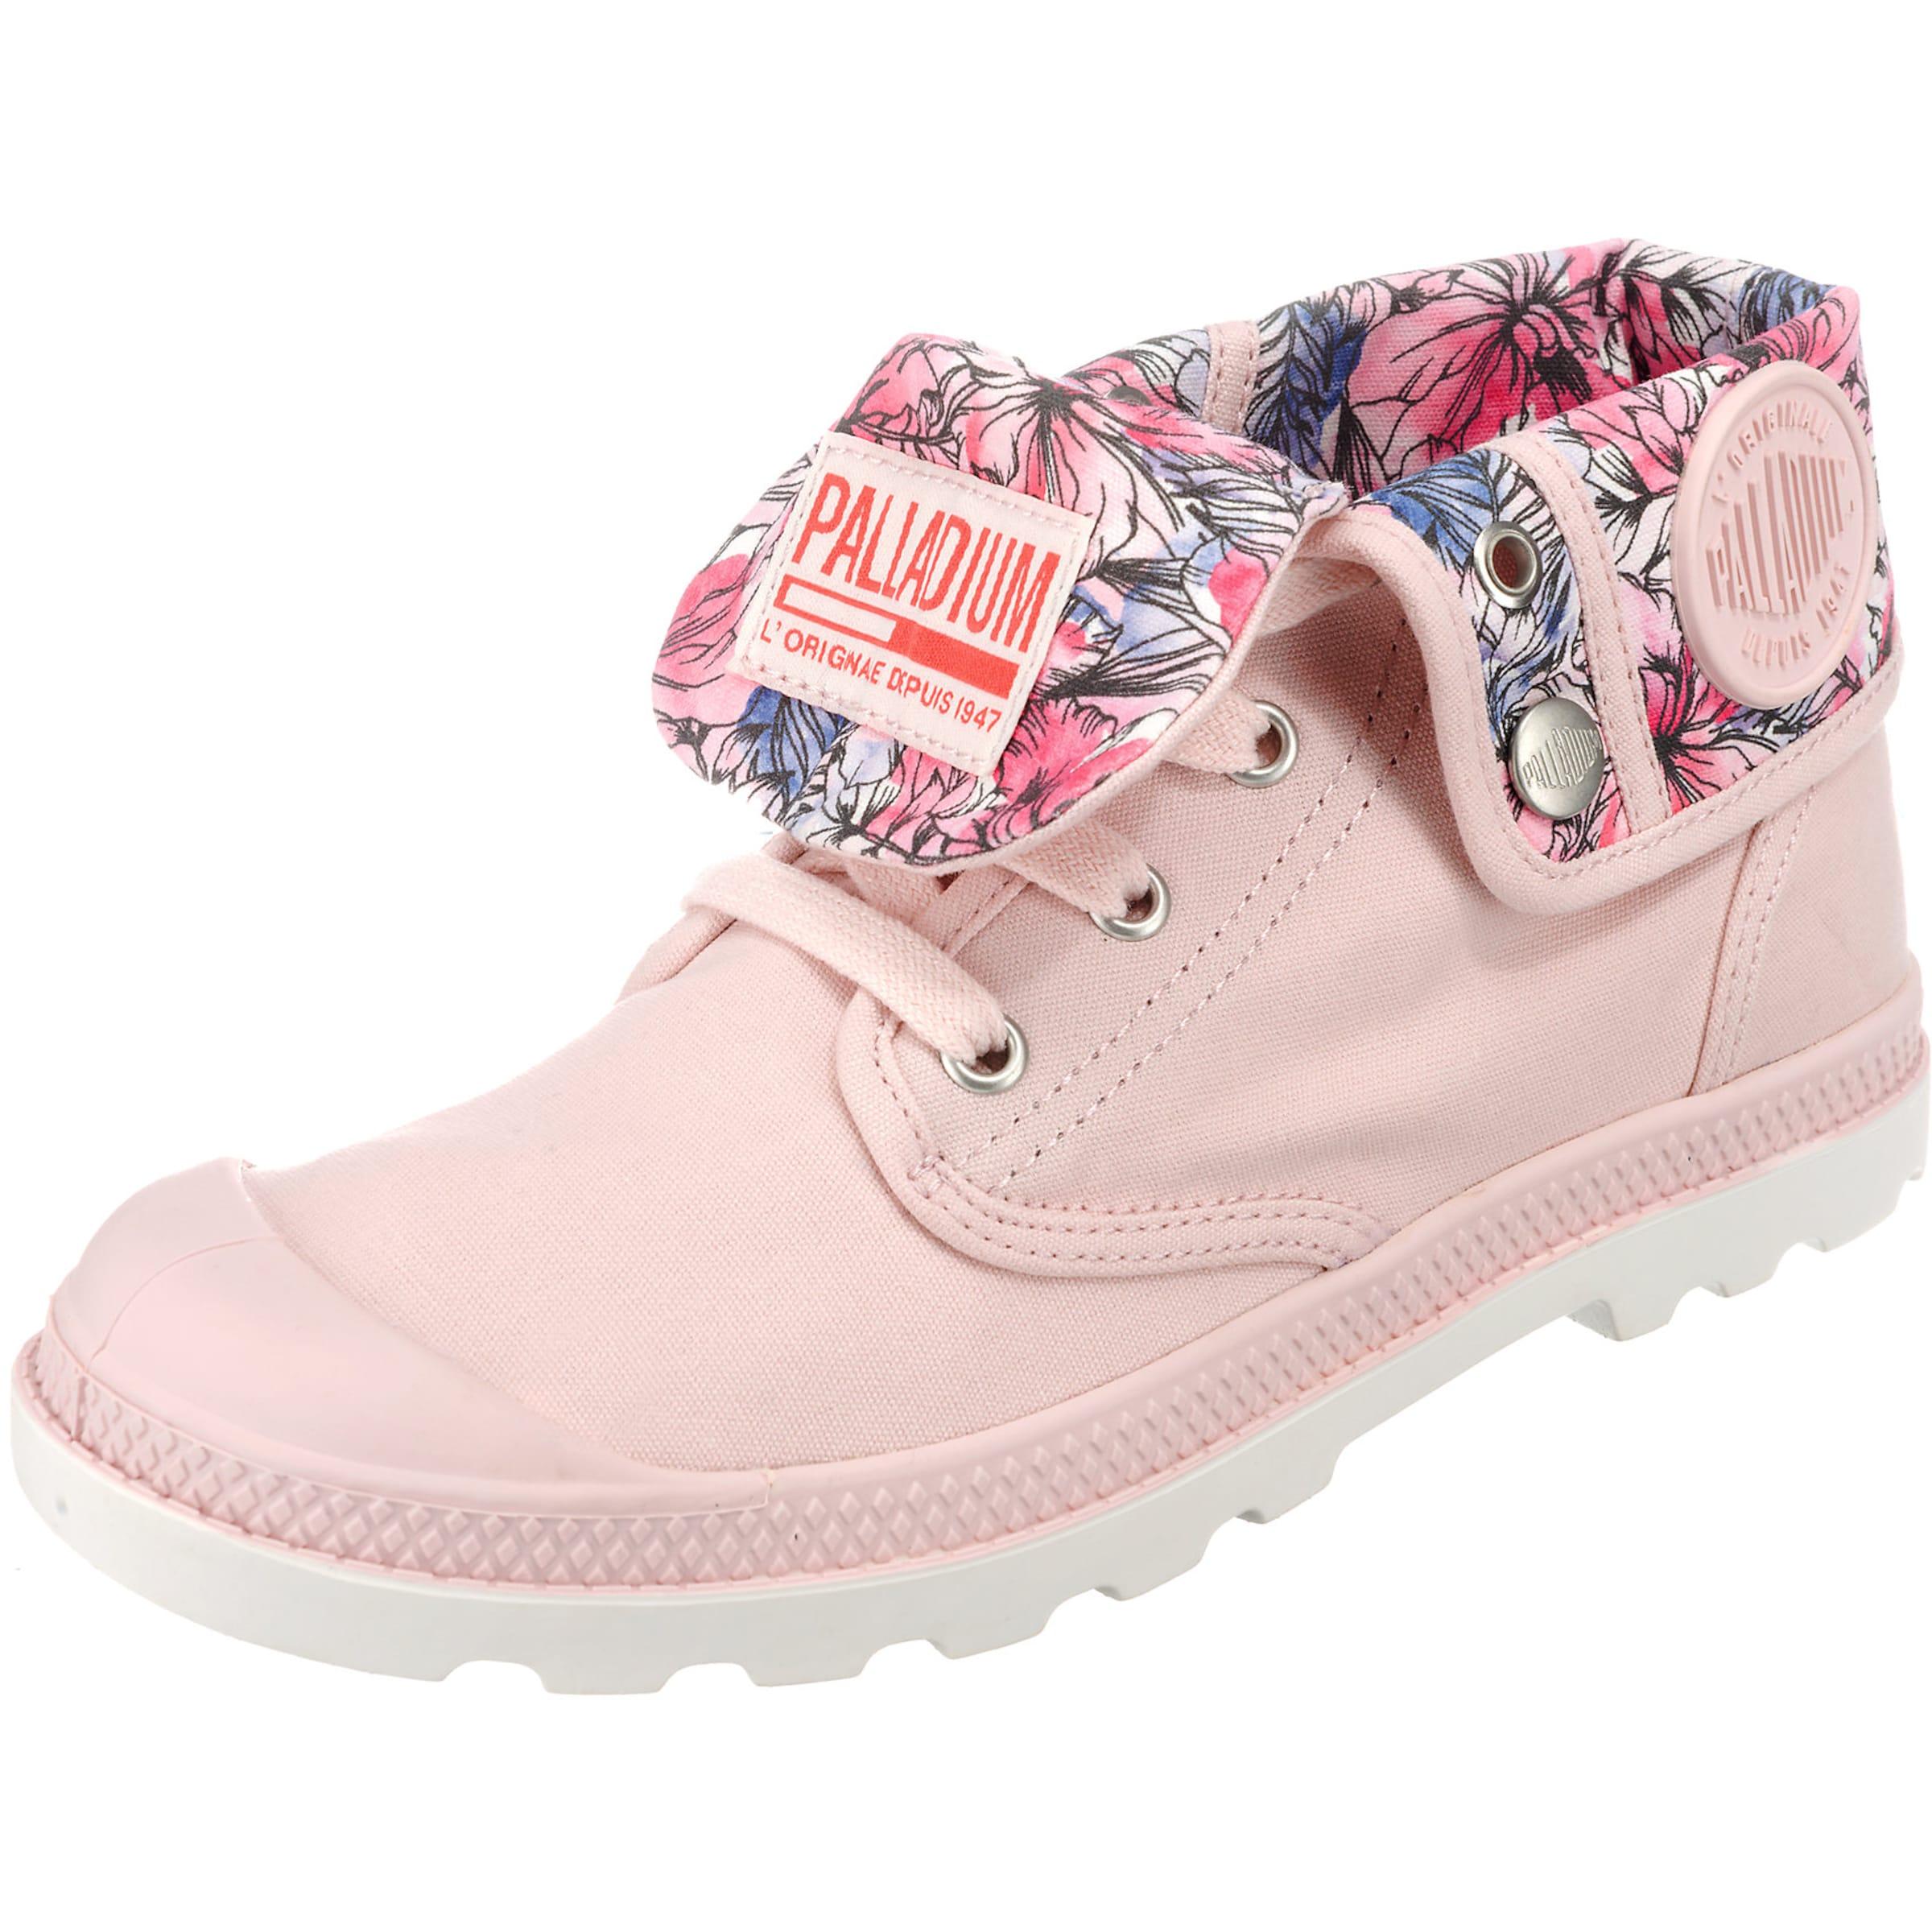 Chaussures De Sport De Palladium Couche Rosa li2bwIrRId